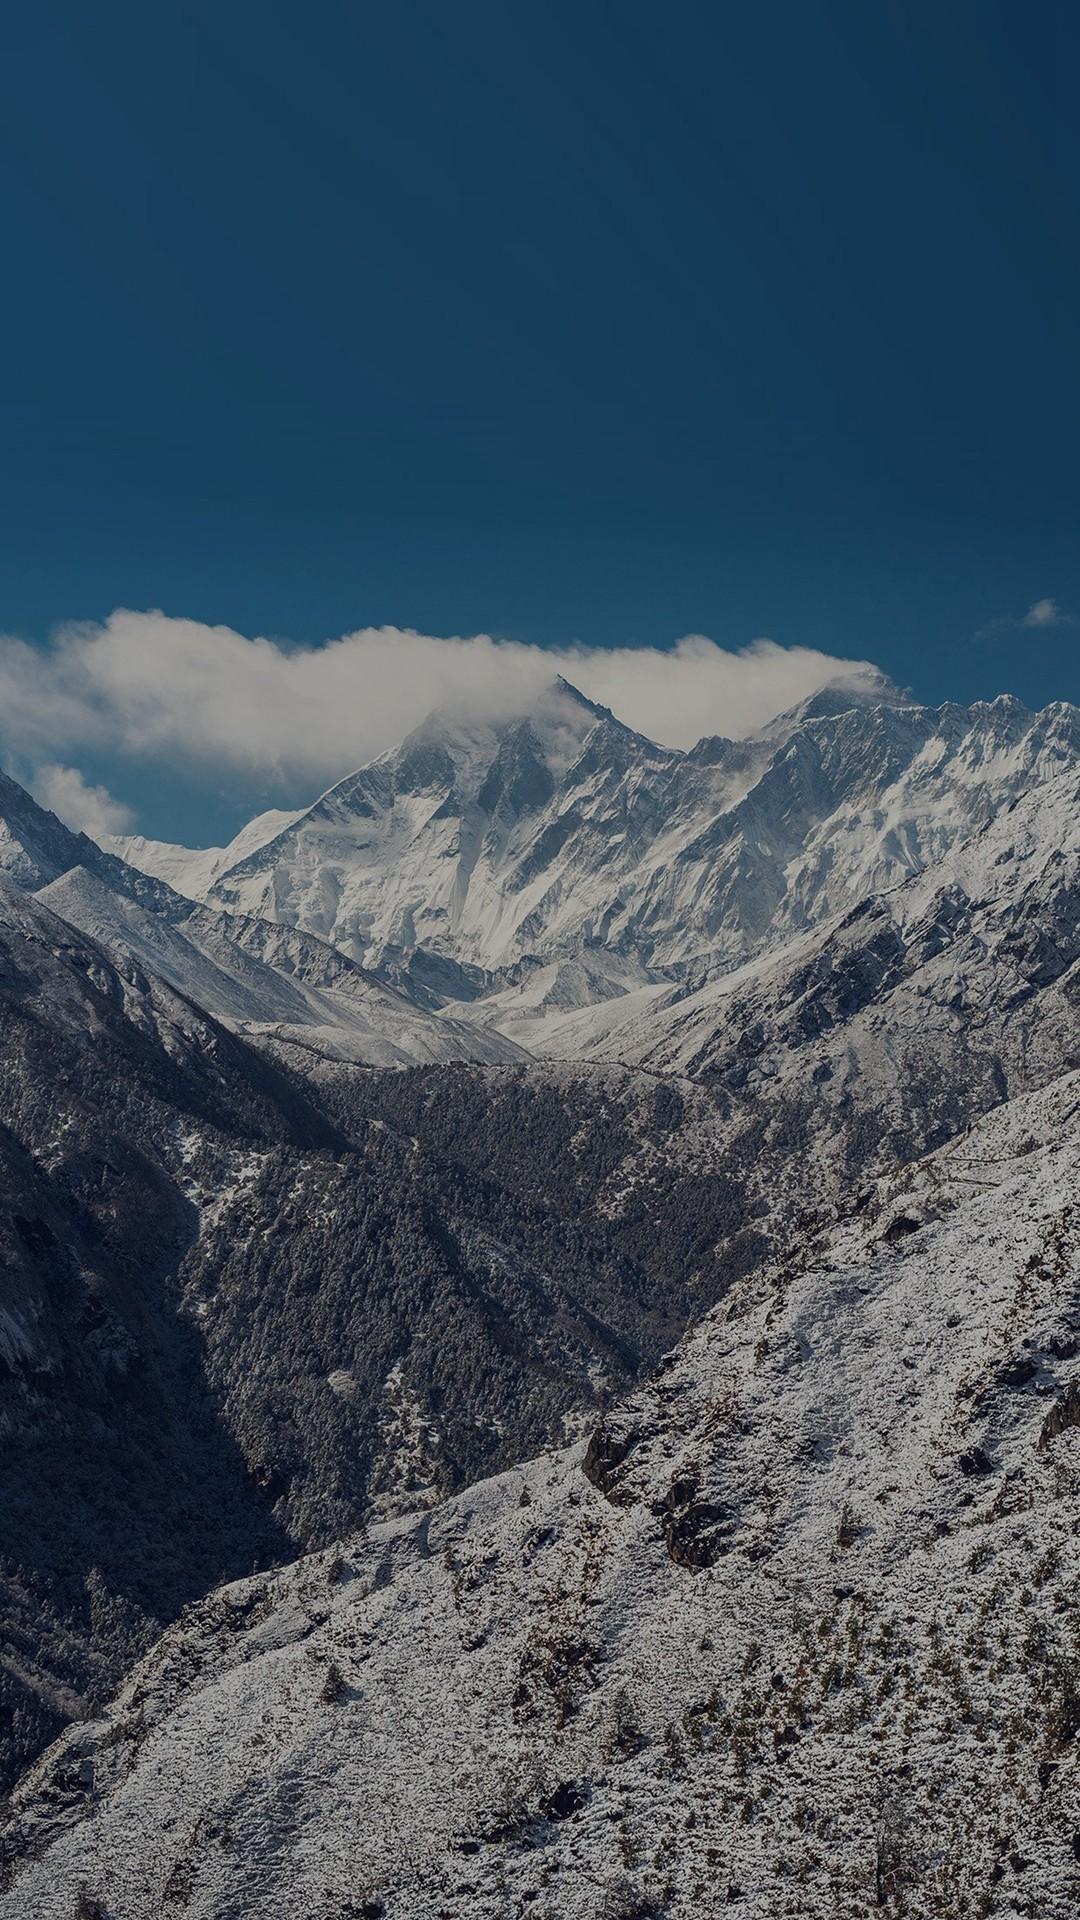 Winter Mountain Nature Snow Dark Alps iPhone 6 wallpaper